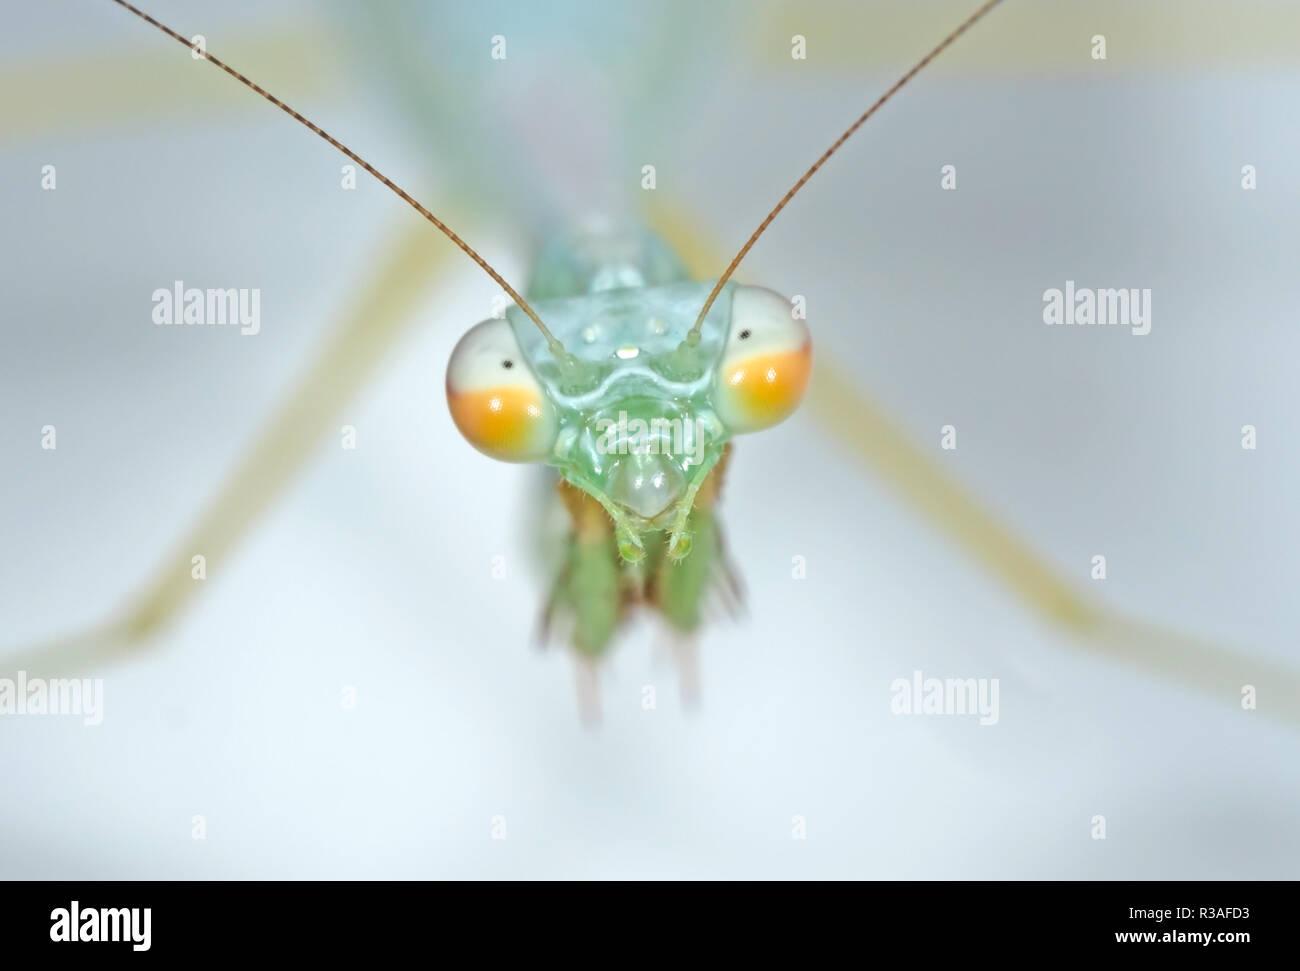 Macro Photography of Head of Praying Mantis Isolated on Background - Stock Image